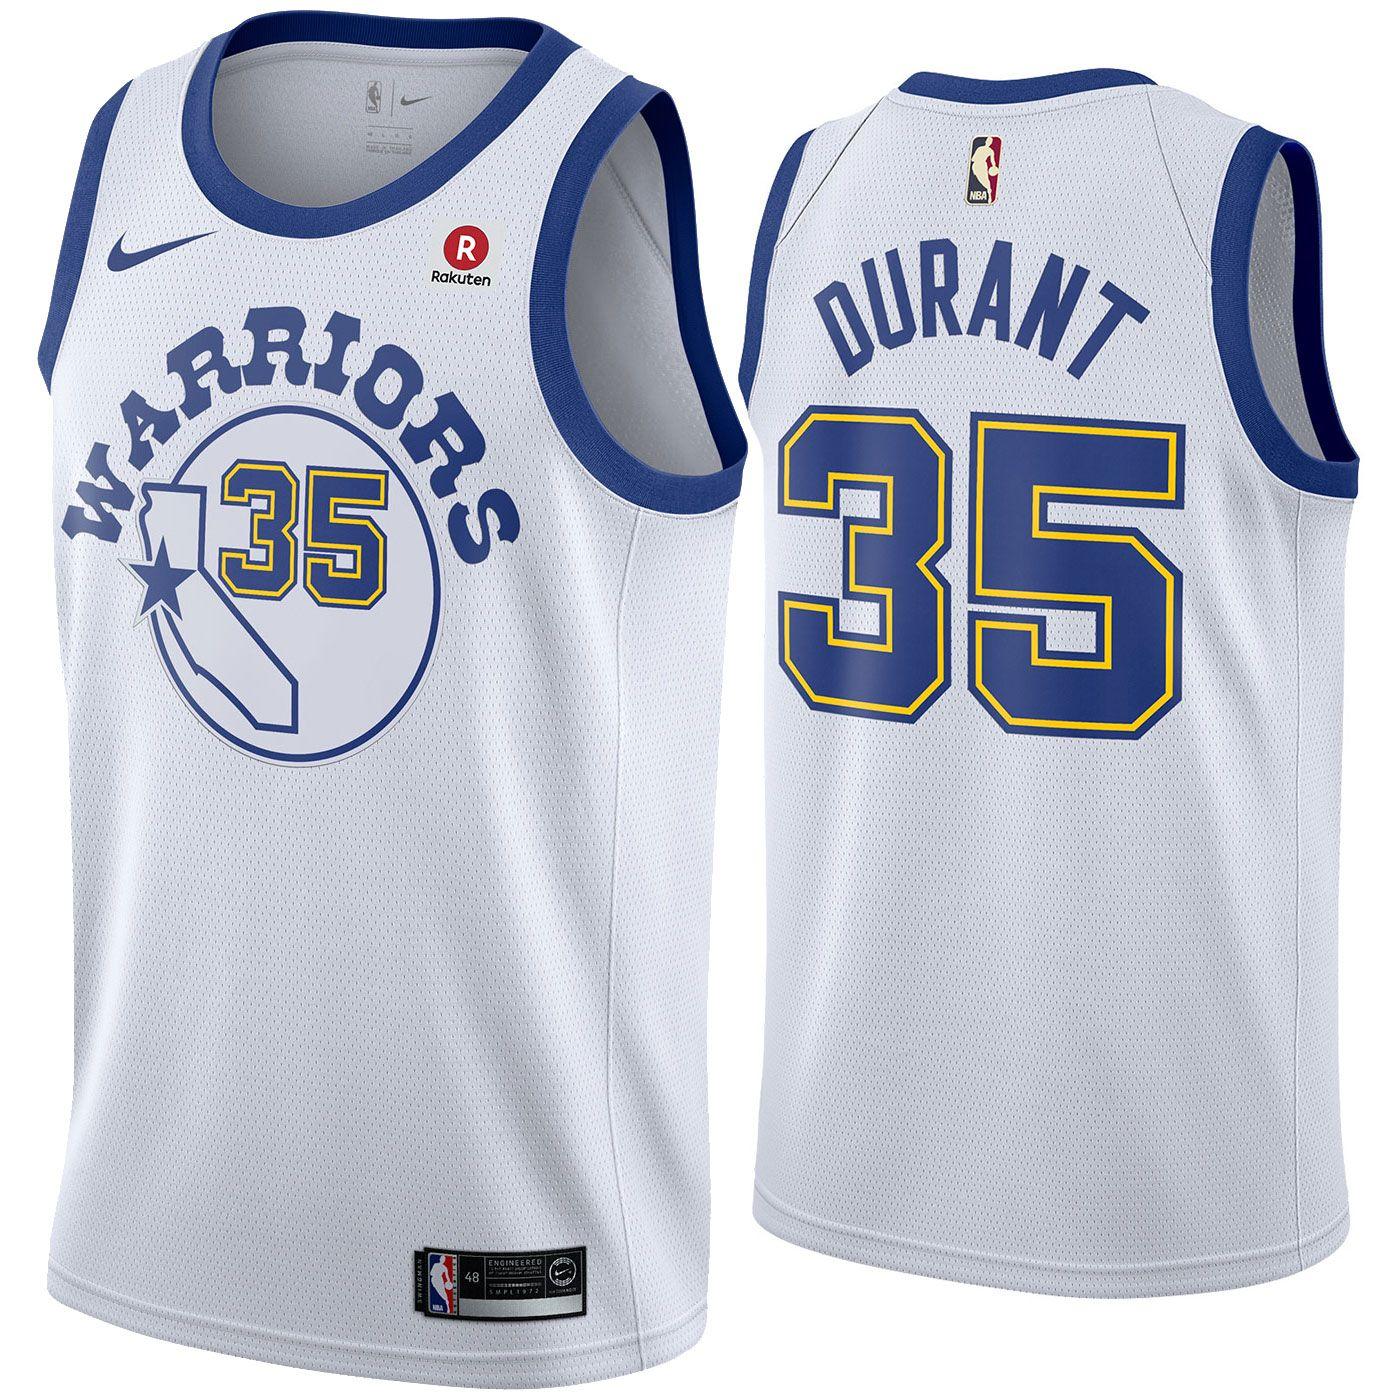 113efc7e811 Golden State Warriors Nike Dri-FIT Men s Kevin Durant  35 Swingman Hardwood  Classic Jersey - White